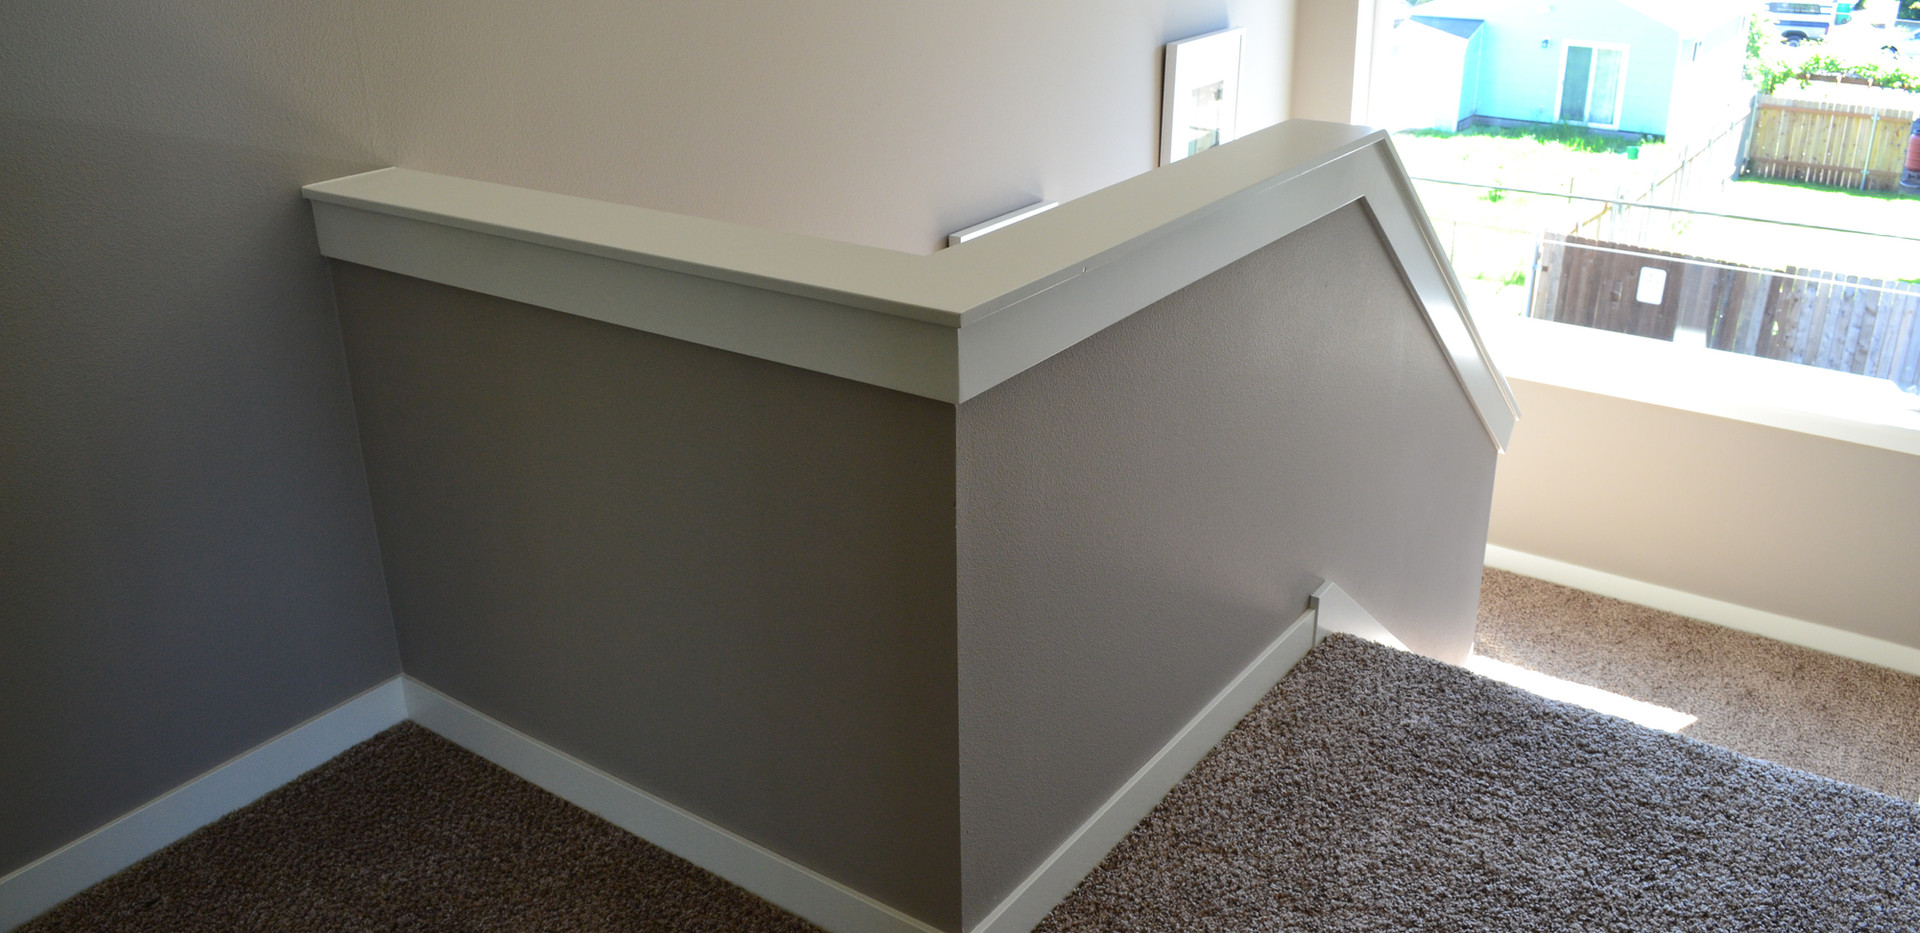 Craftsman Half Wall Cap and Casing Detail